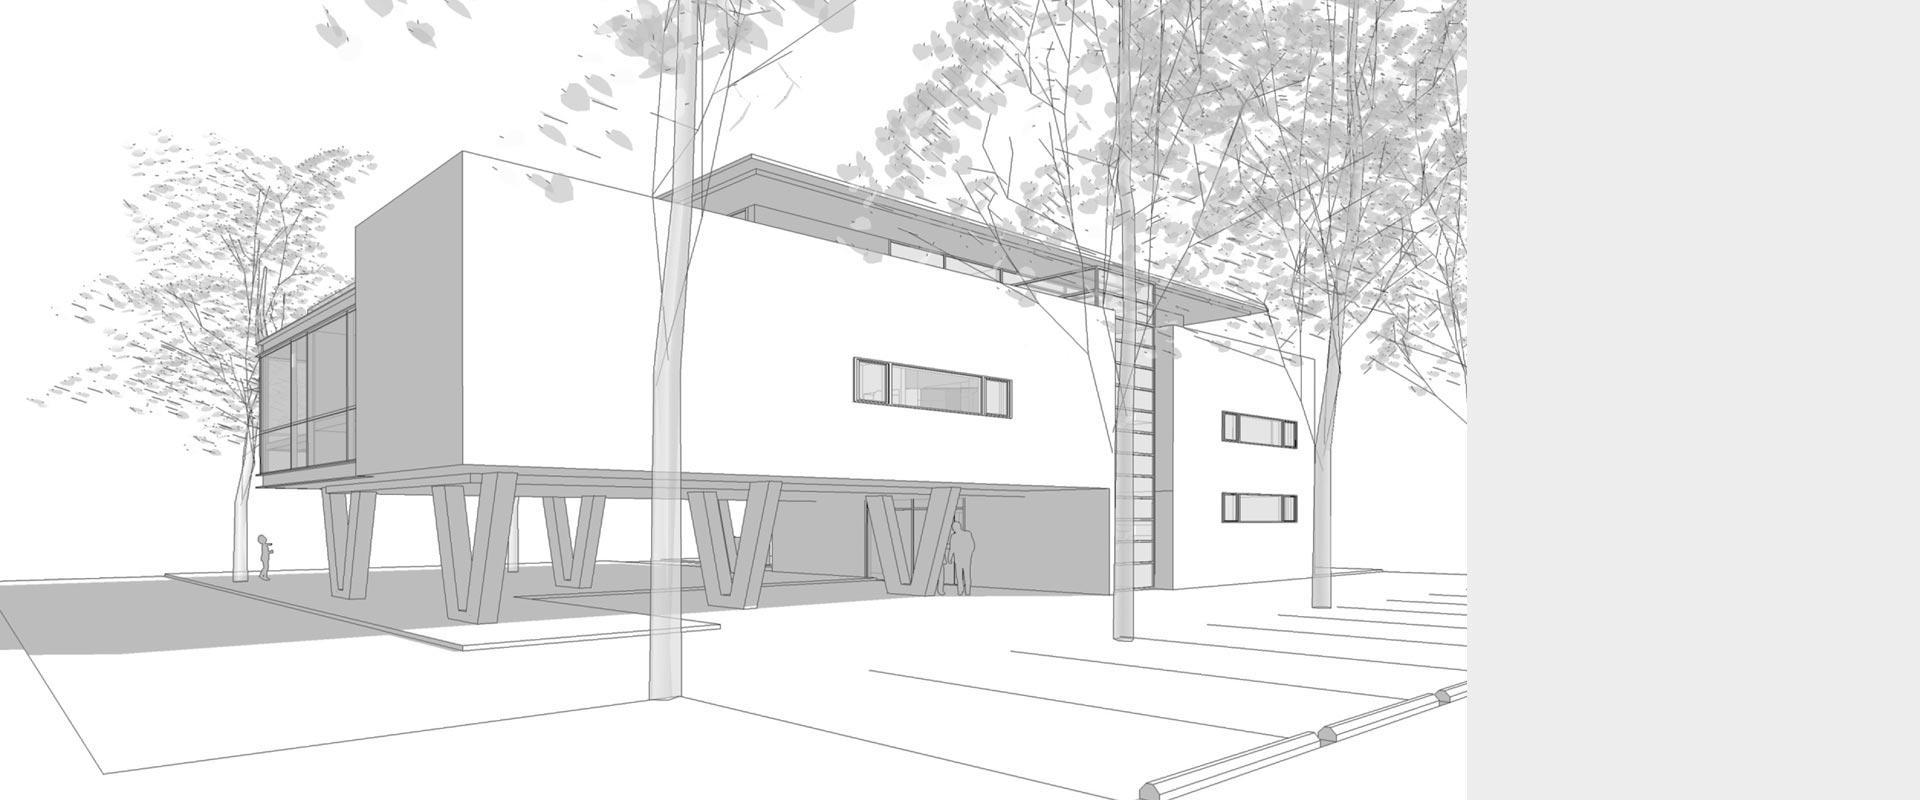 architekturbuero_henning_musahl_waldshut_zahnklinik02